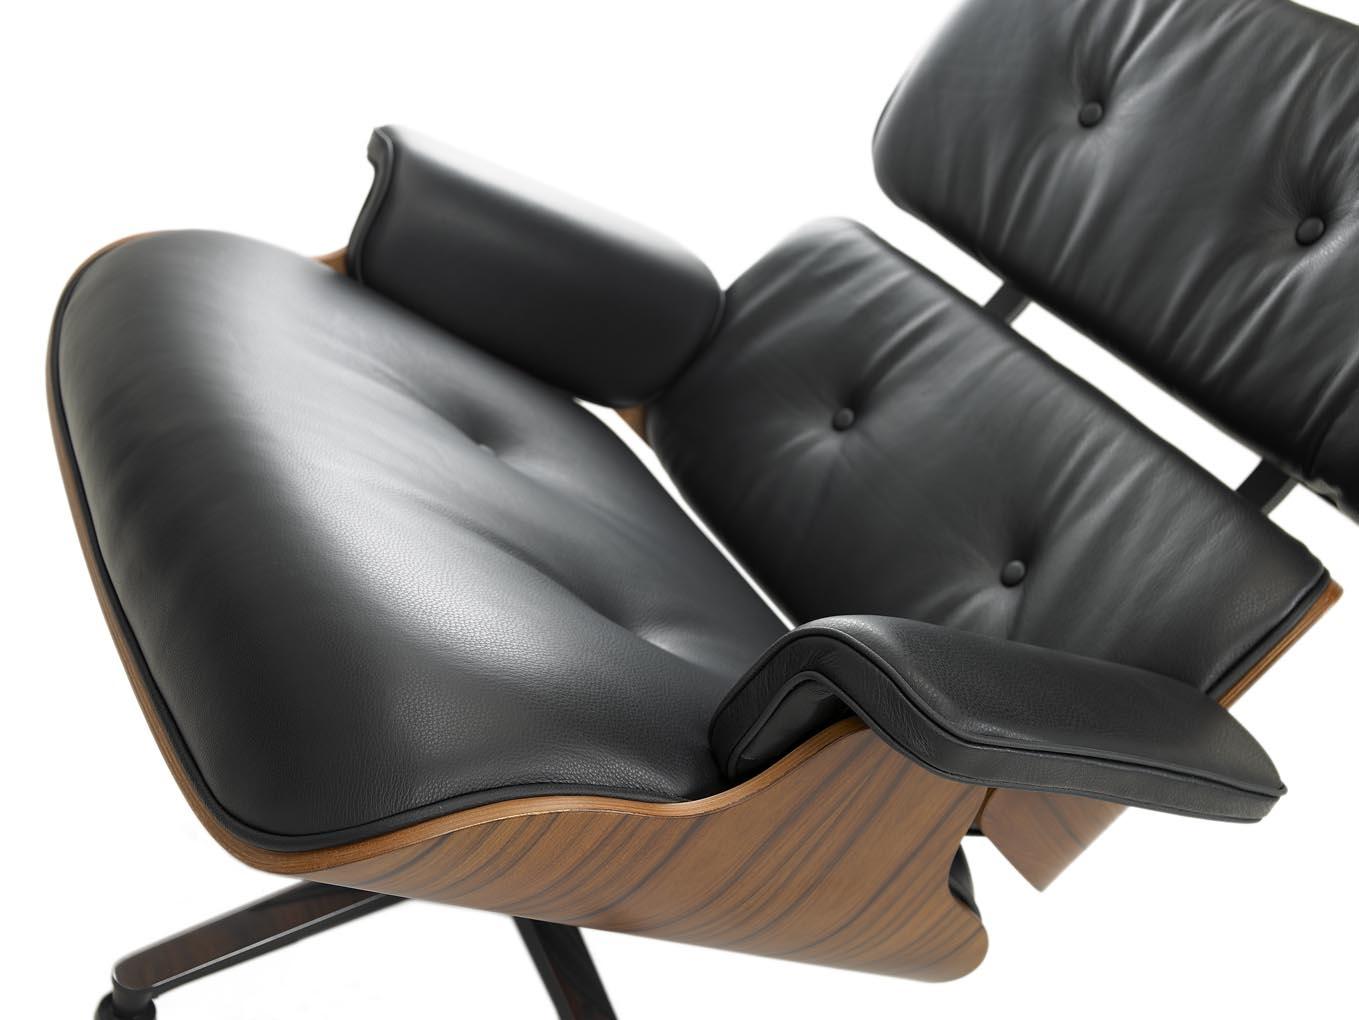 chaise longue eames poltrona. Black Bedroom Furniture Sets. Home Design Ideas